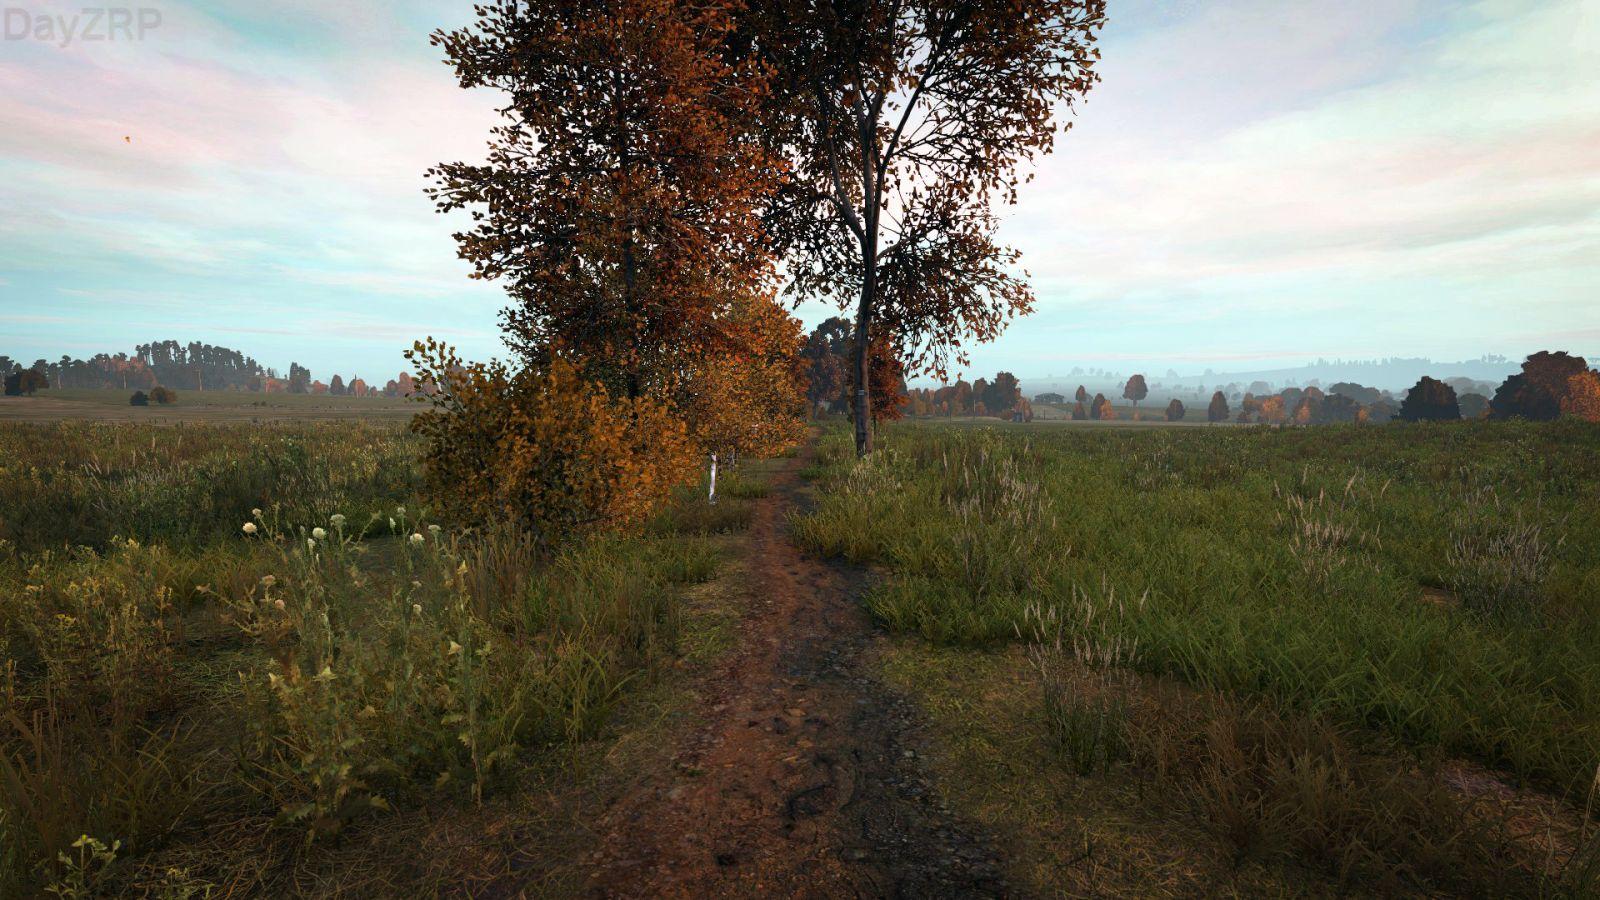 Countryside Dirt Road